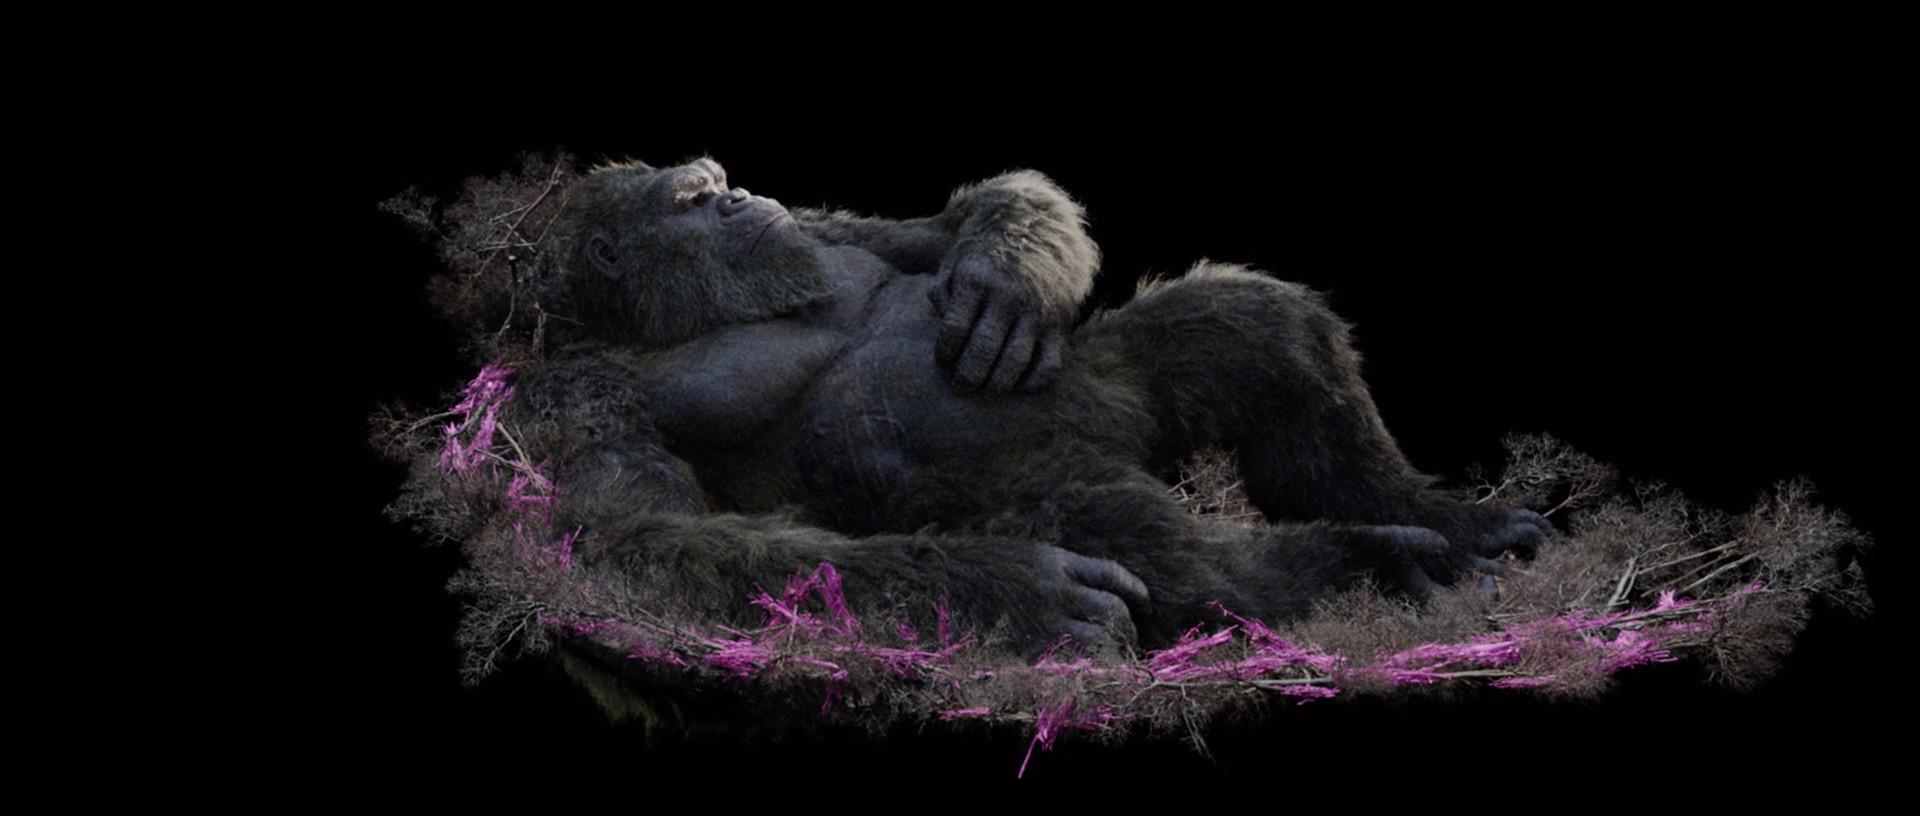 Godzilla vs Kong - visual effects by Weta Digital